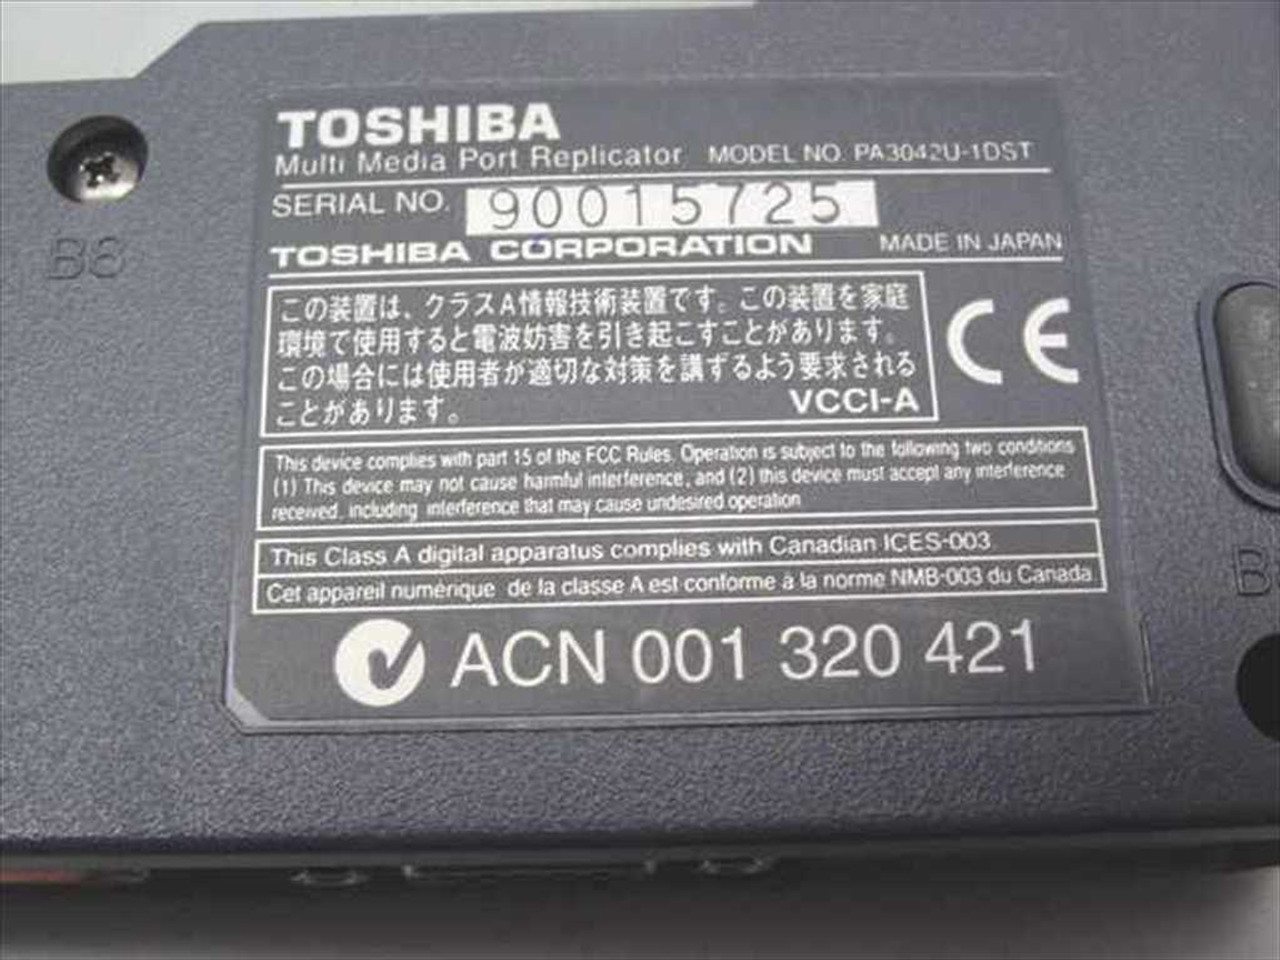 Toshiba Pa3042u 1dst Portege 3440ct Multimedia Port Replicator Psc0 Laptop Wiring Diagram